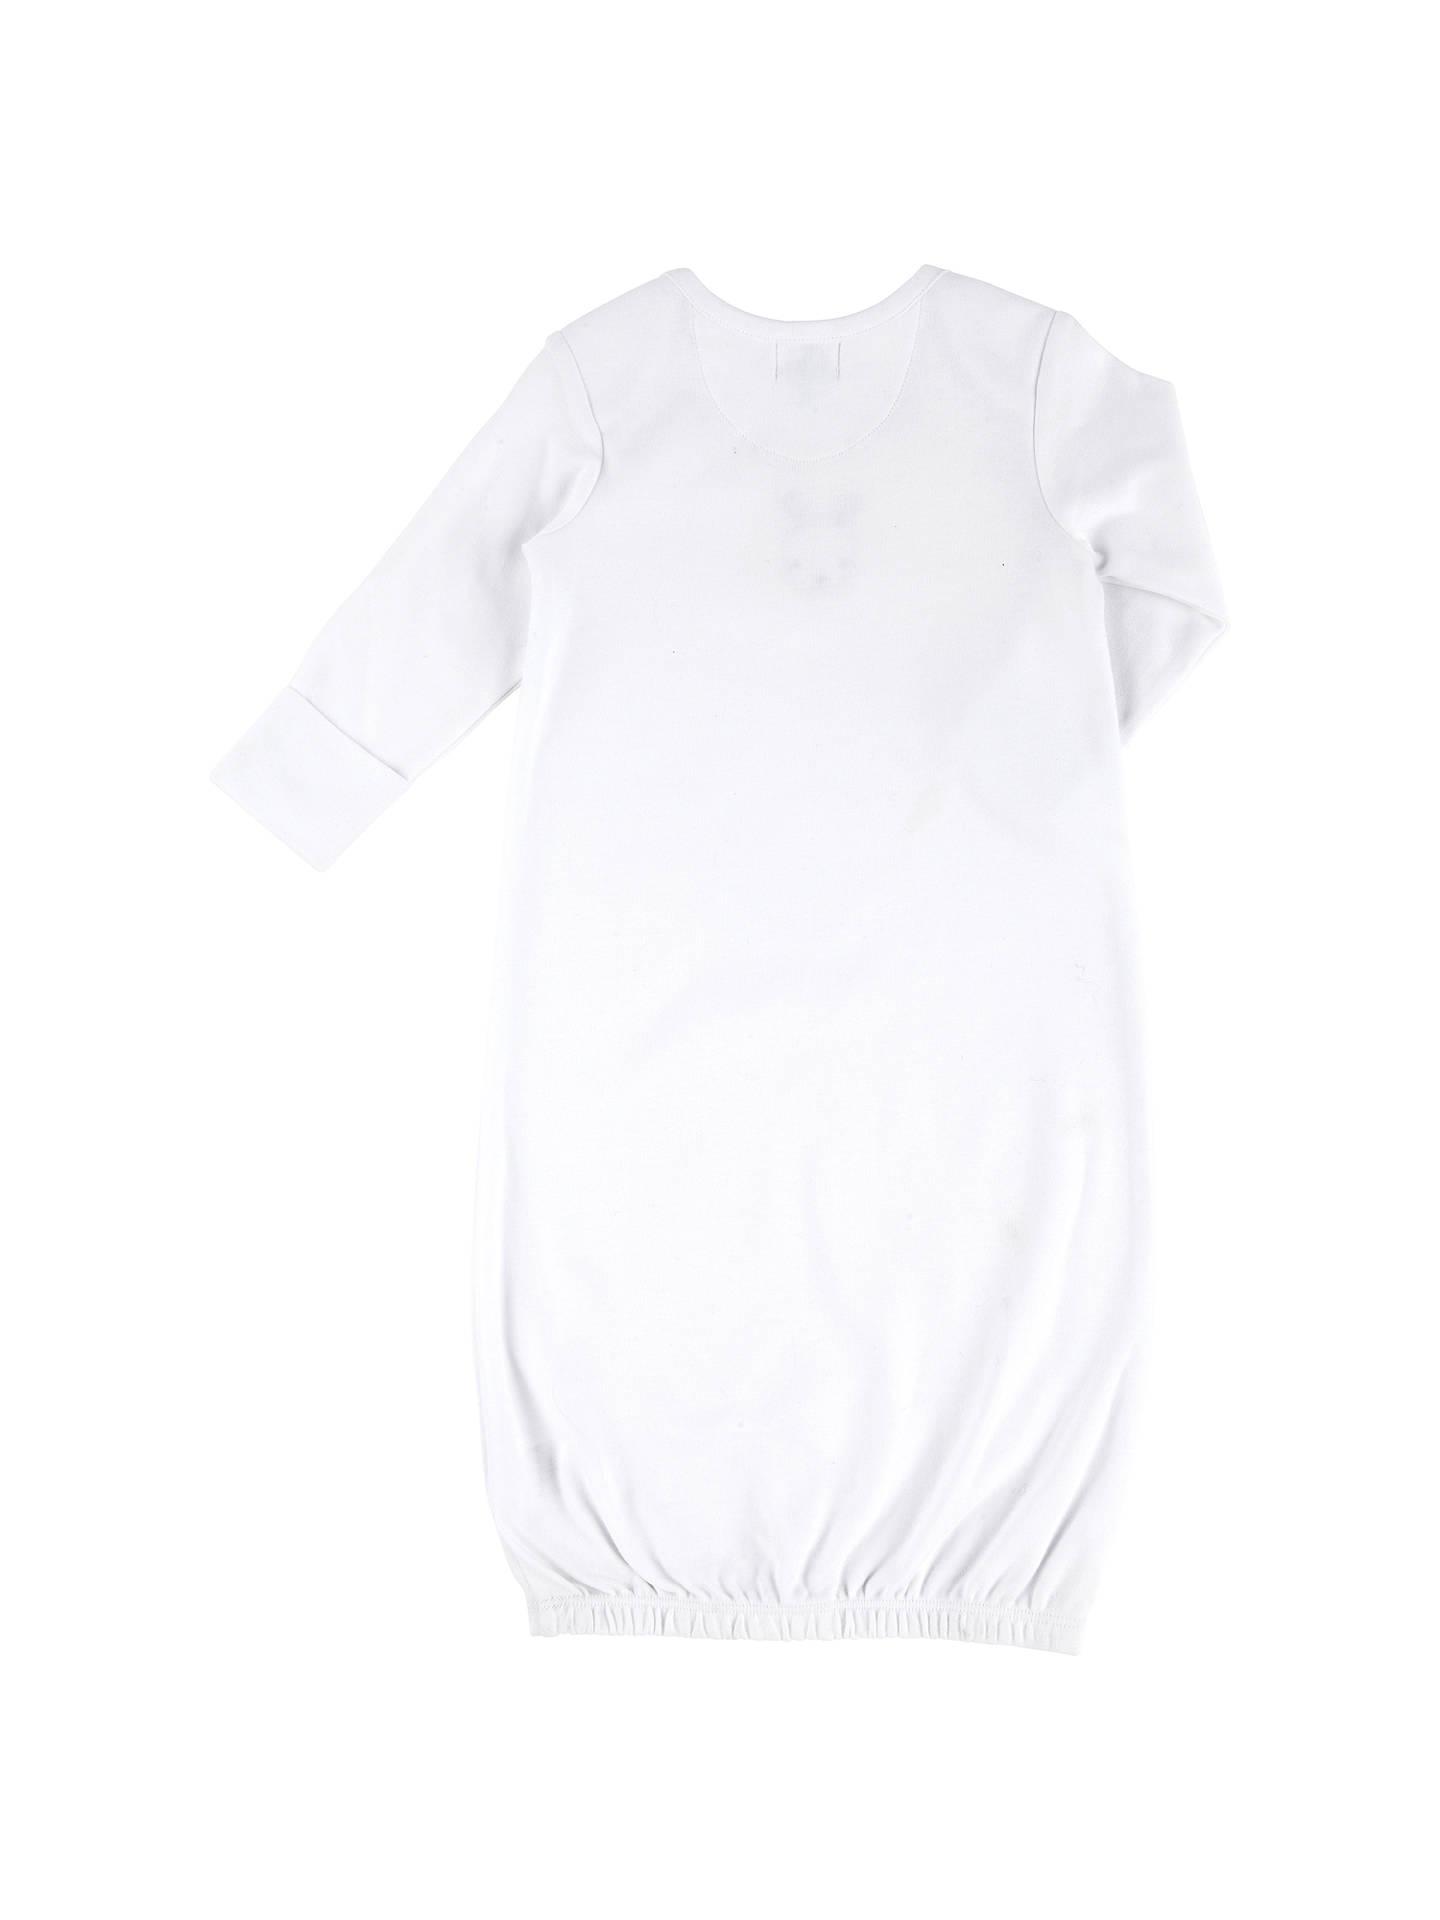 efaab3e117e ... Buy John Lewis   Partners Baby Organic Cotton Bunny Bundler